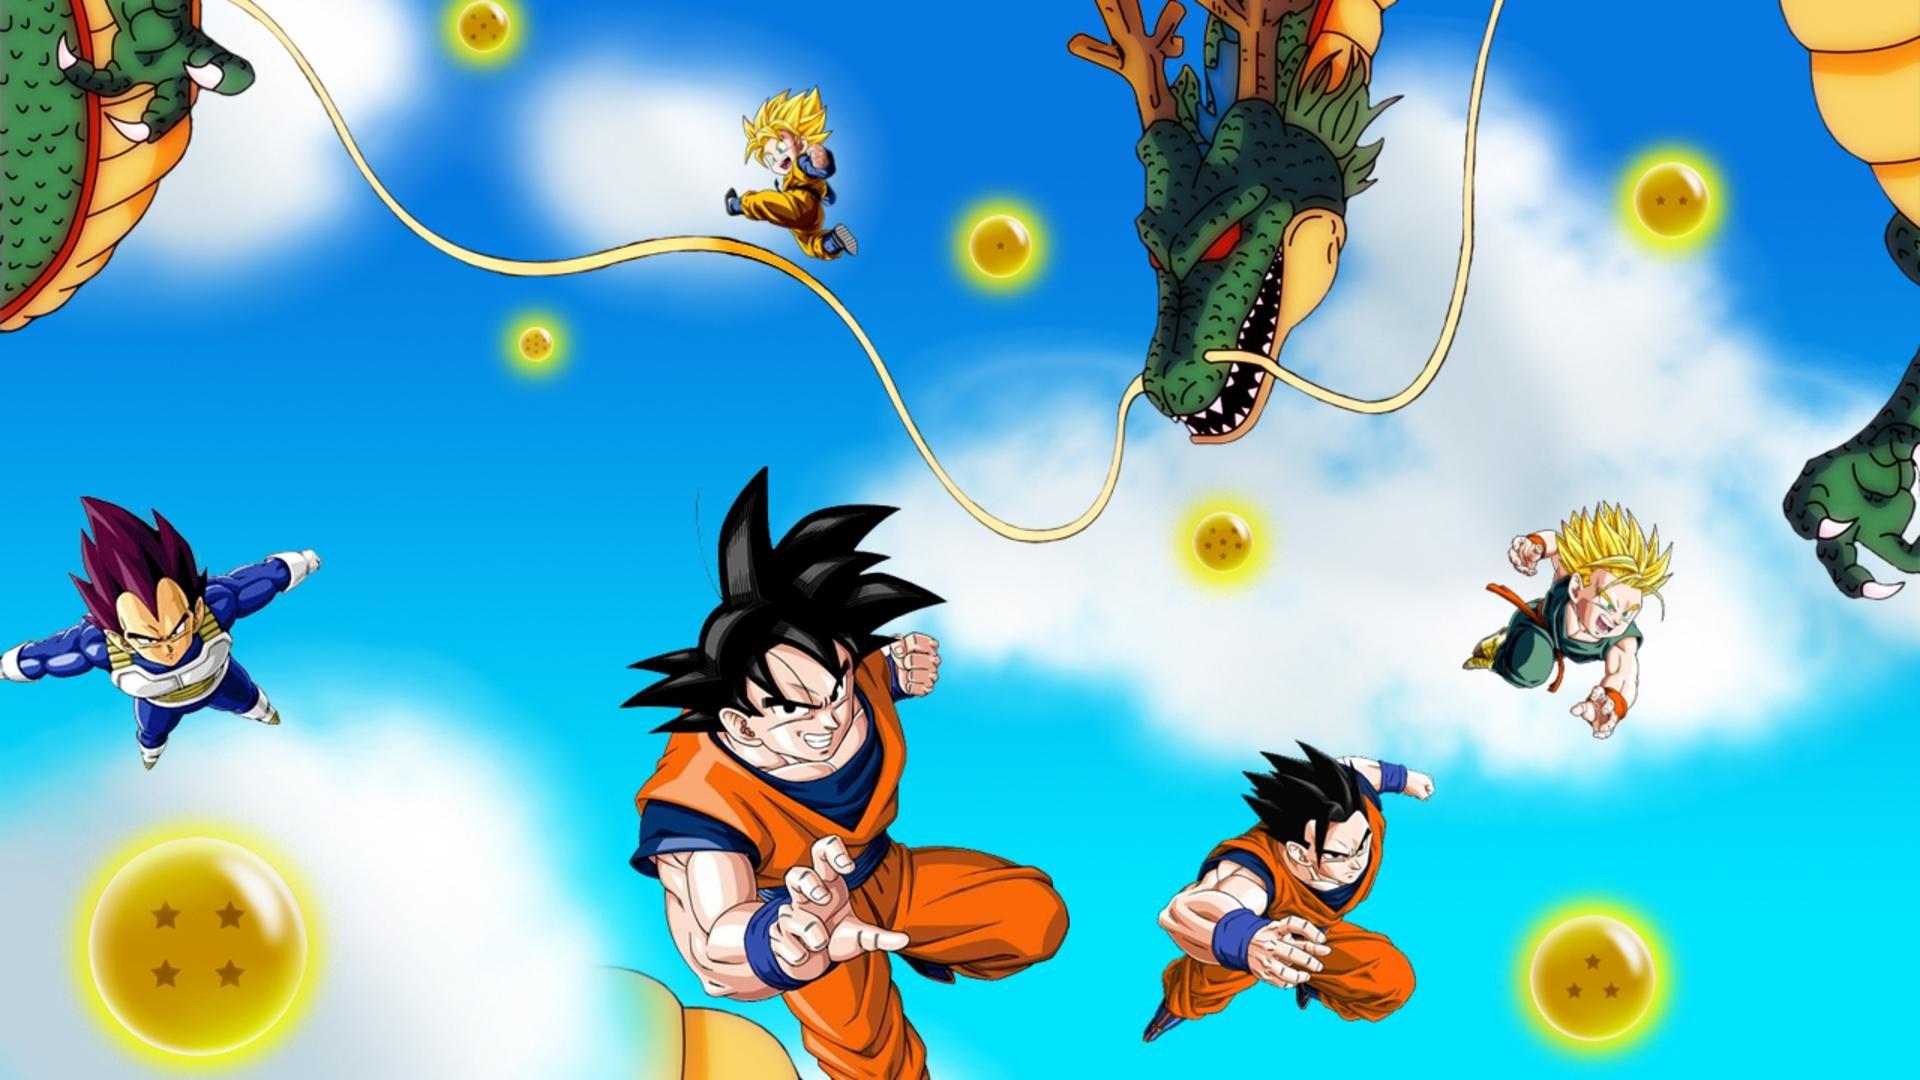 Dragon Ball Z HD Wallpaper For Download